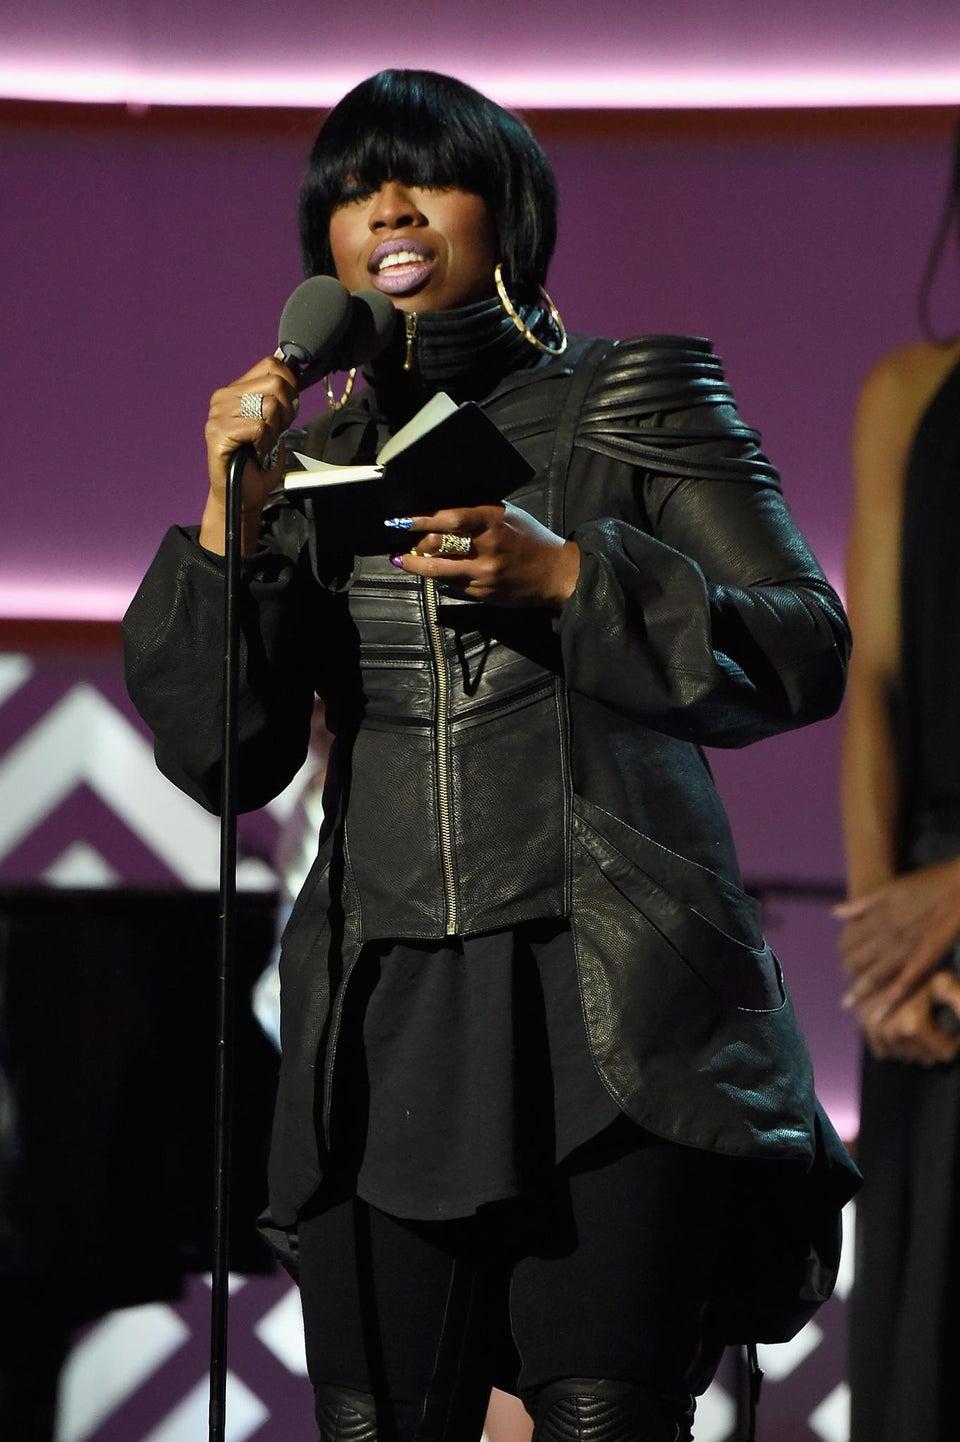 Missy Elliot Delivers Emotional Speech While Accepting Billboard 'Innovator' Award